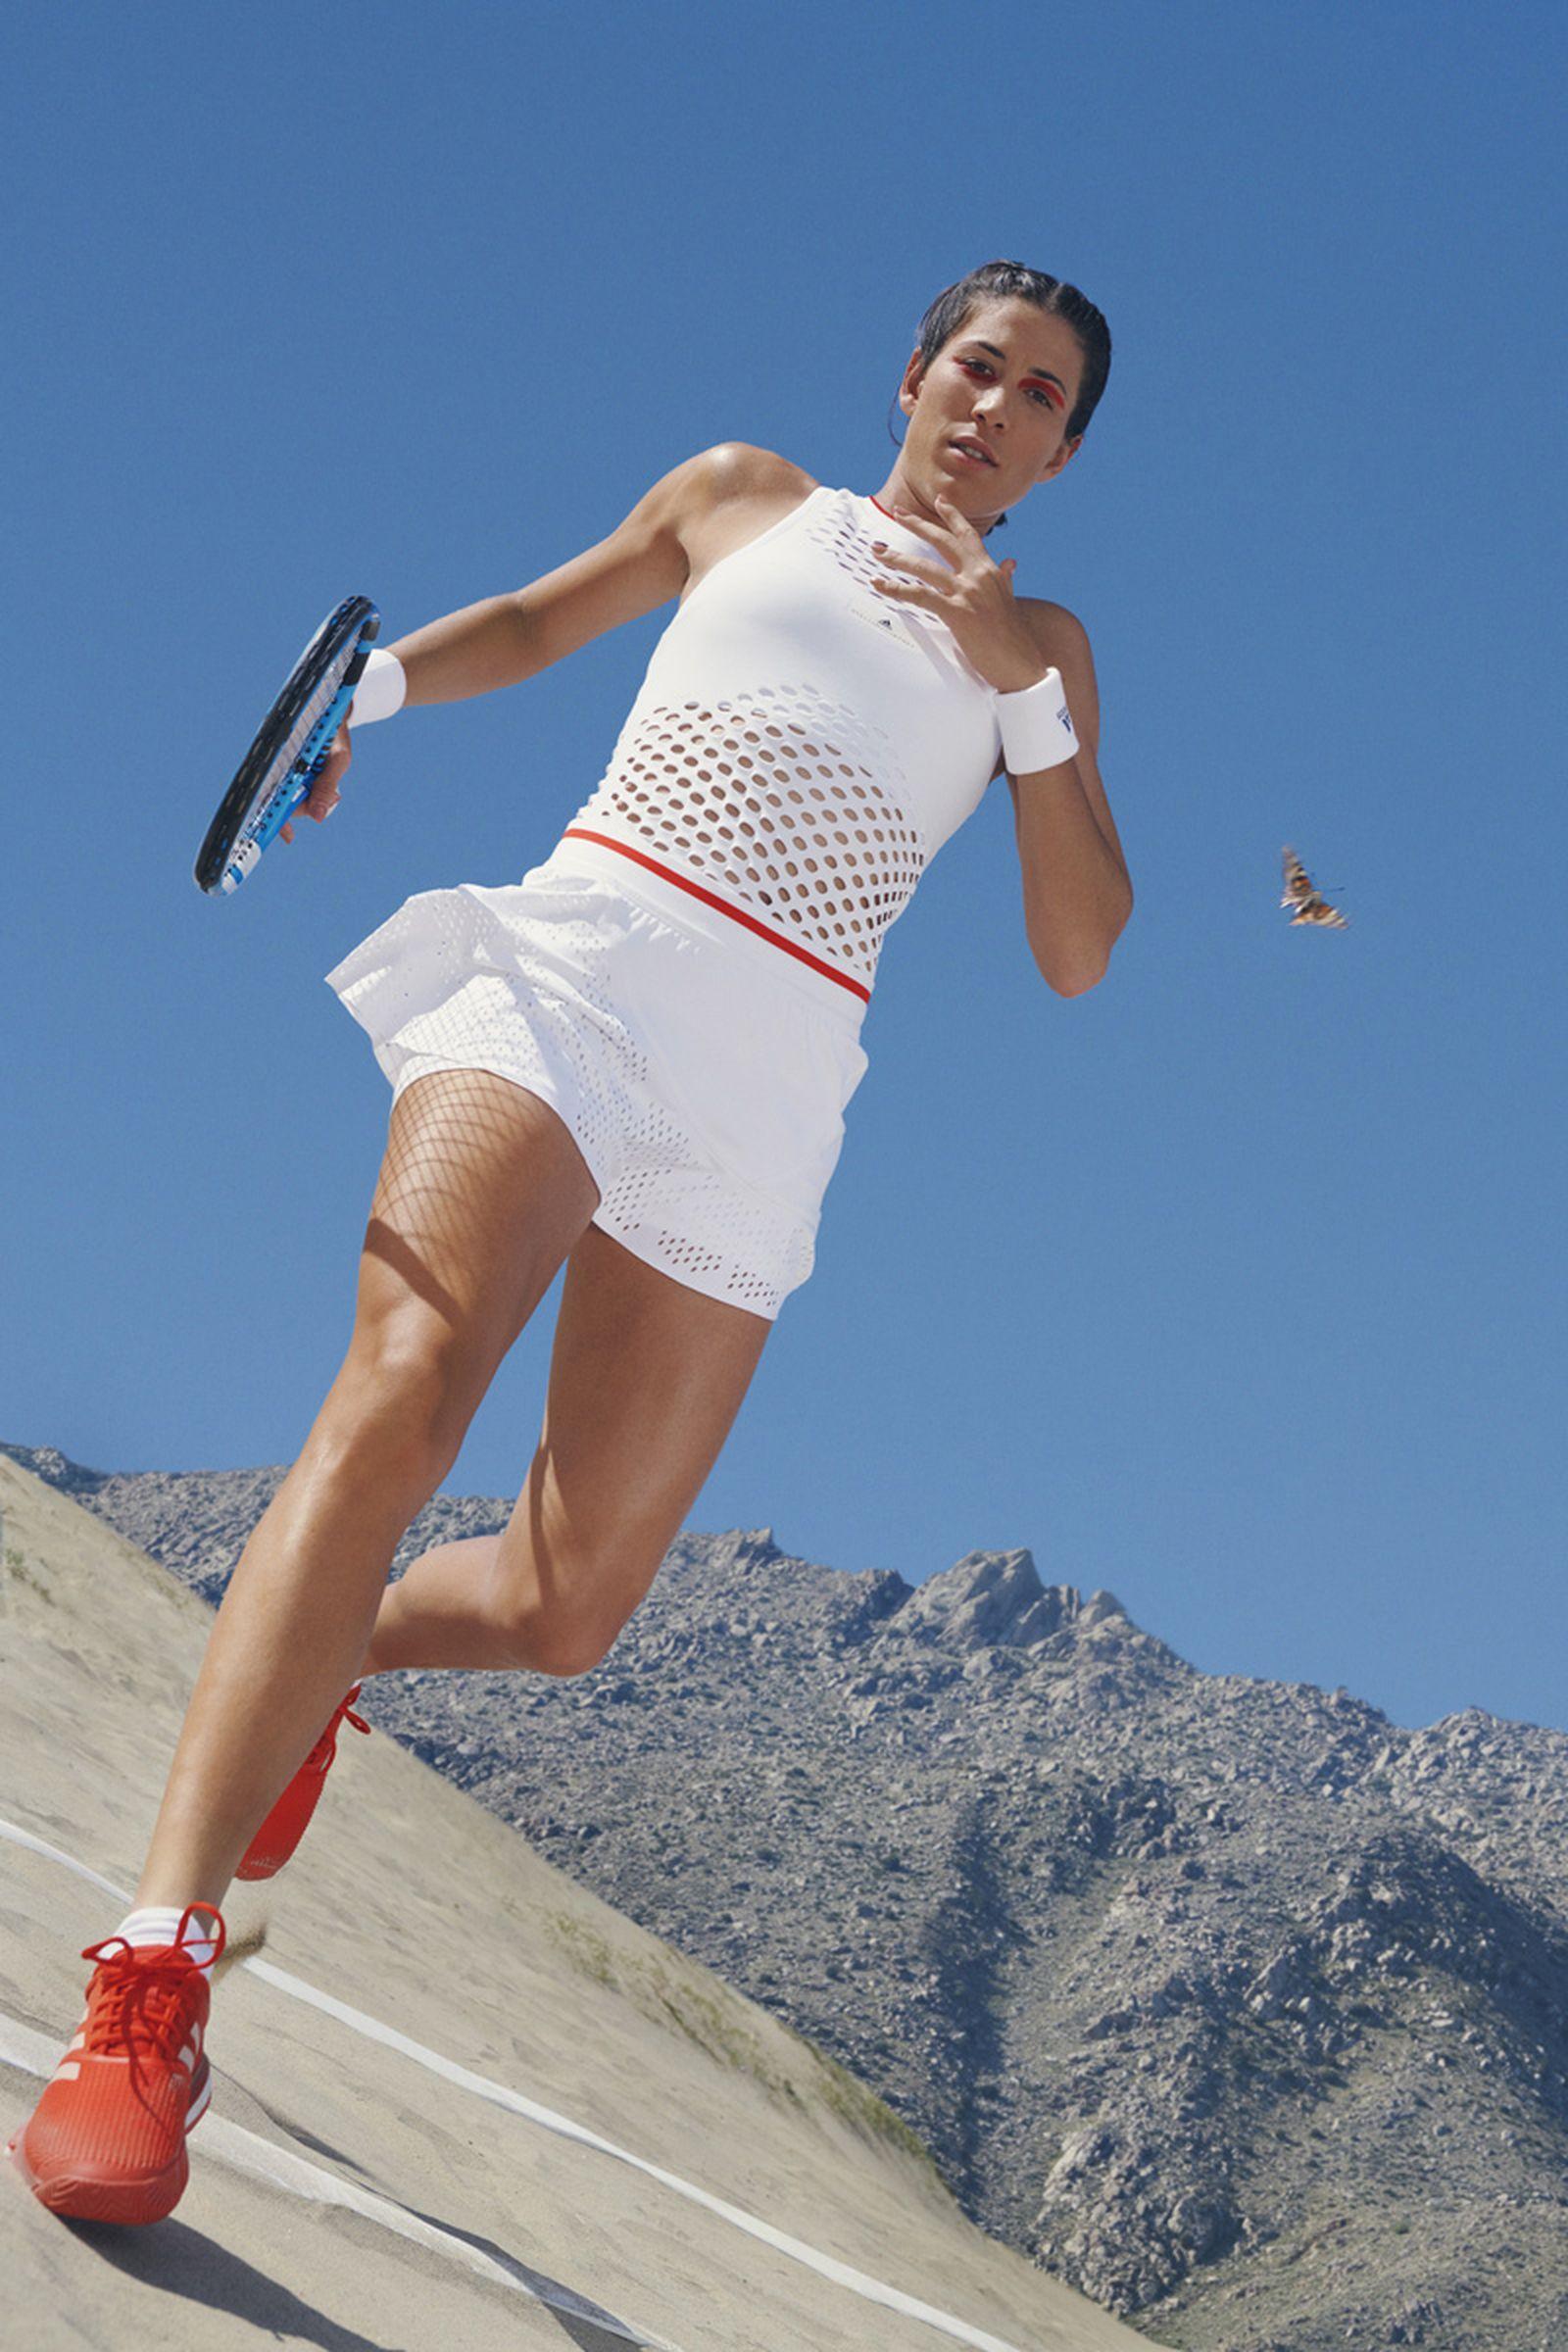 adidas stell mccartney Wimbledon adidas Parley adidas by Stella McCartney